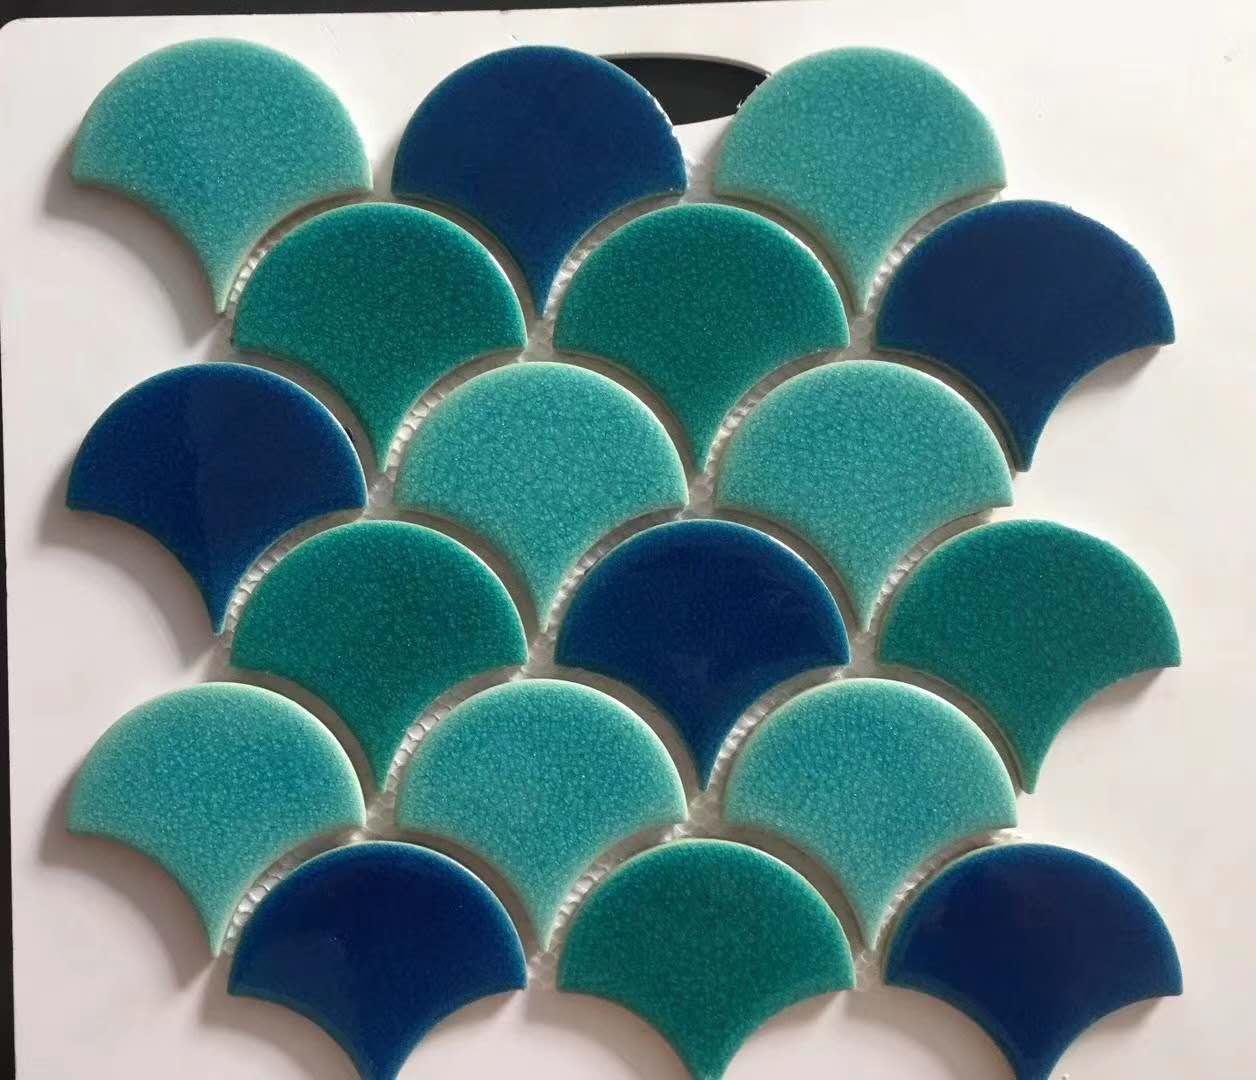 fish scale glazed porcelain tile bathroom backsplash mosaic wall tiles